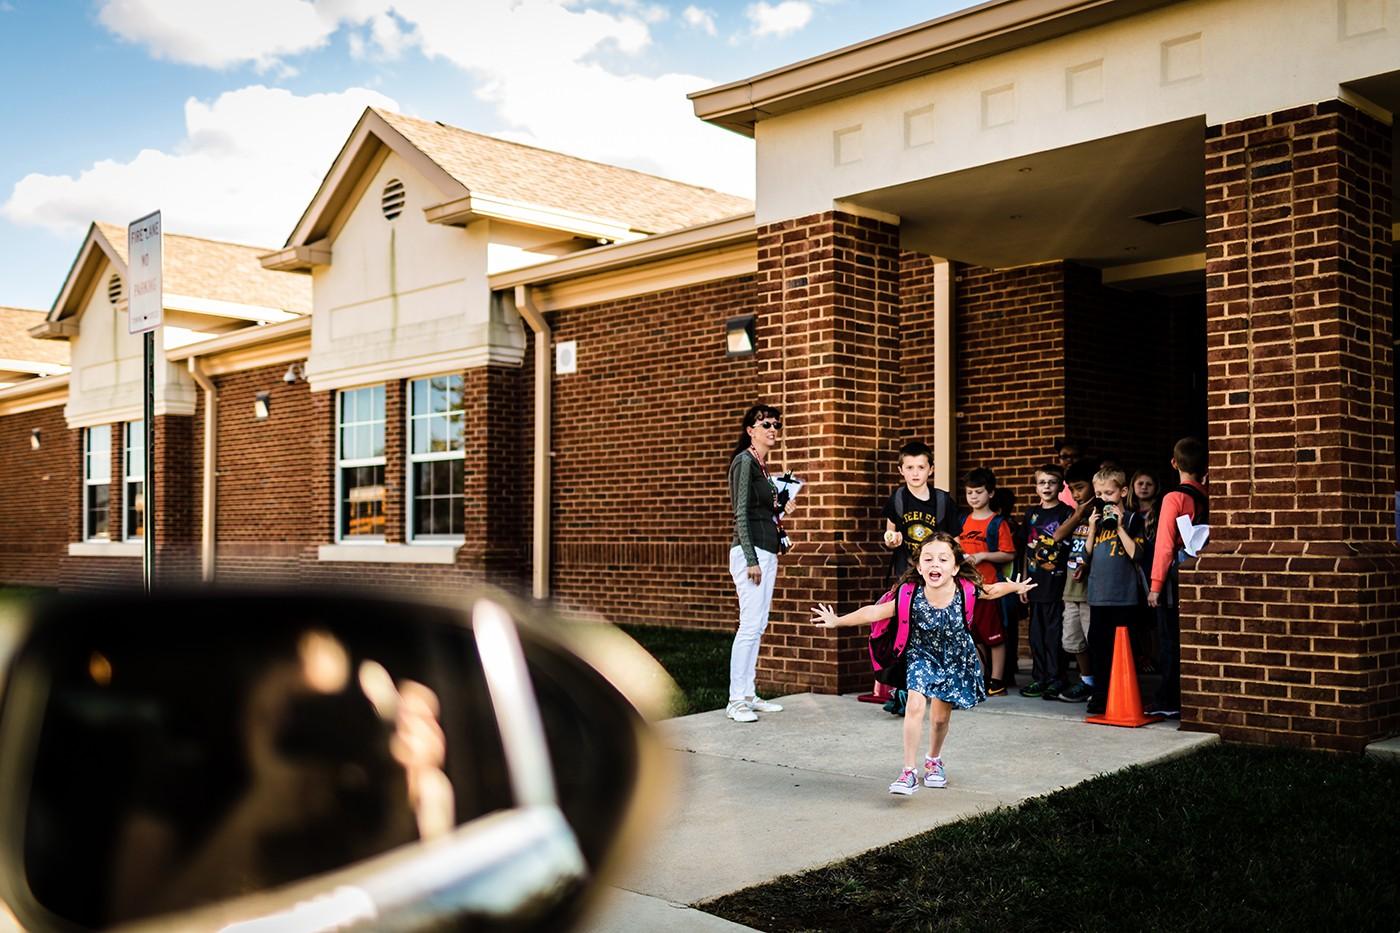 After School Pickup by Jennifer Nobriga